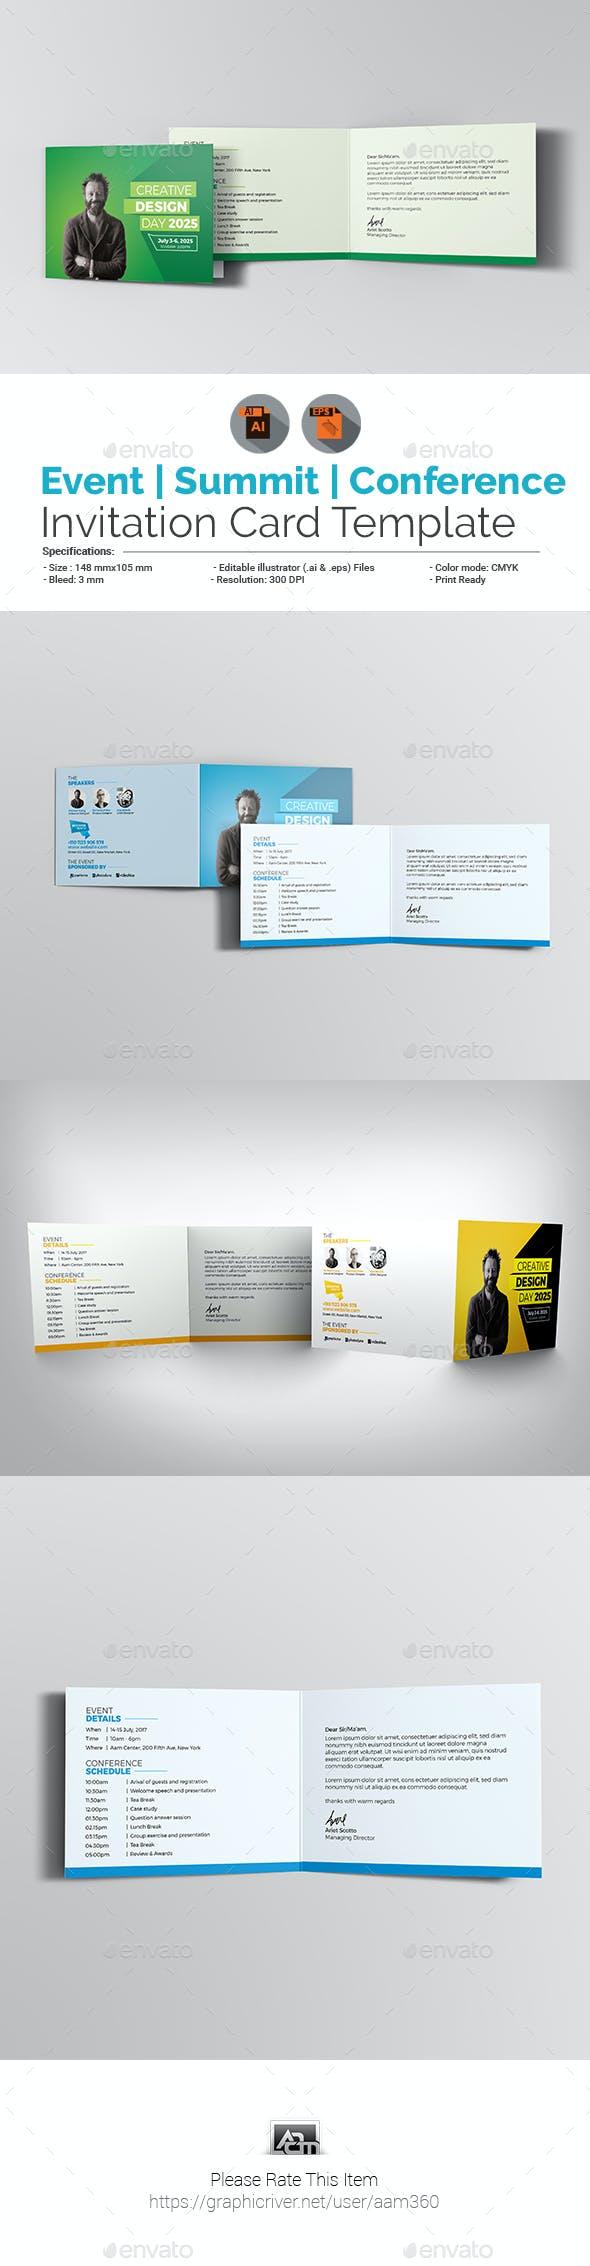 Event Summit Conference Invitation Card